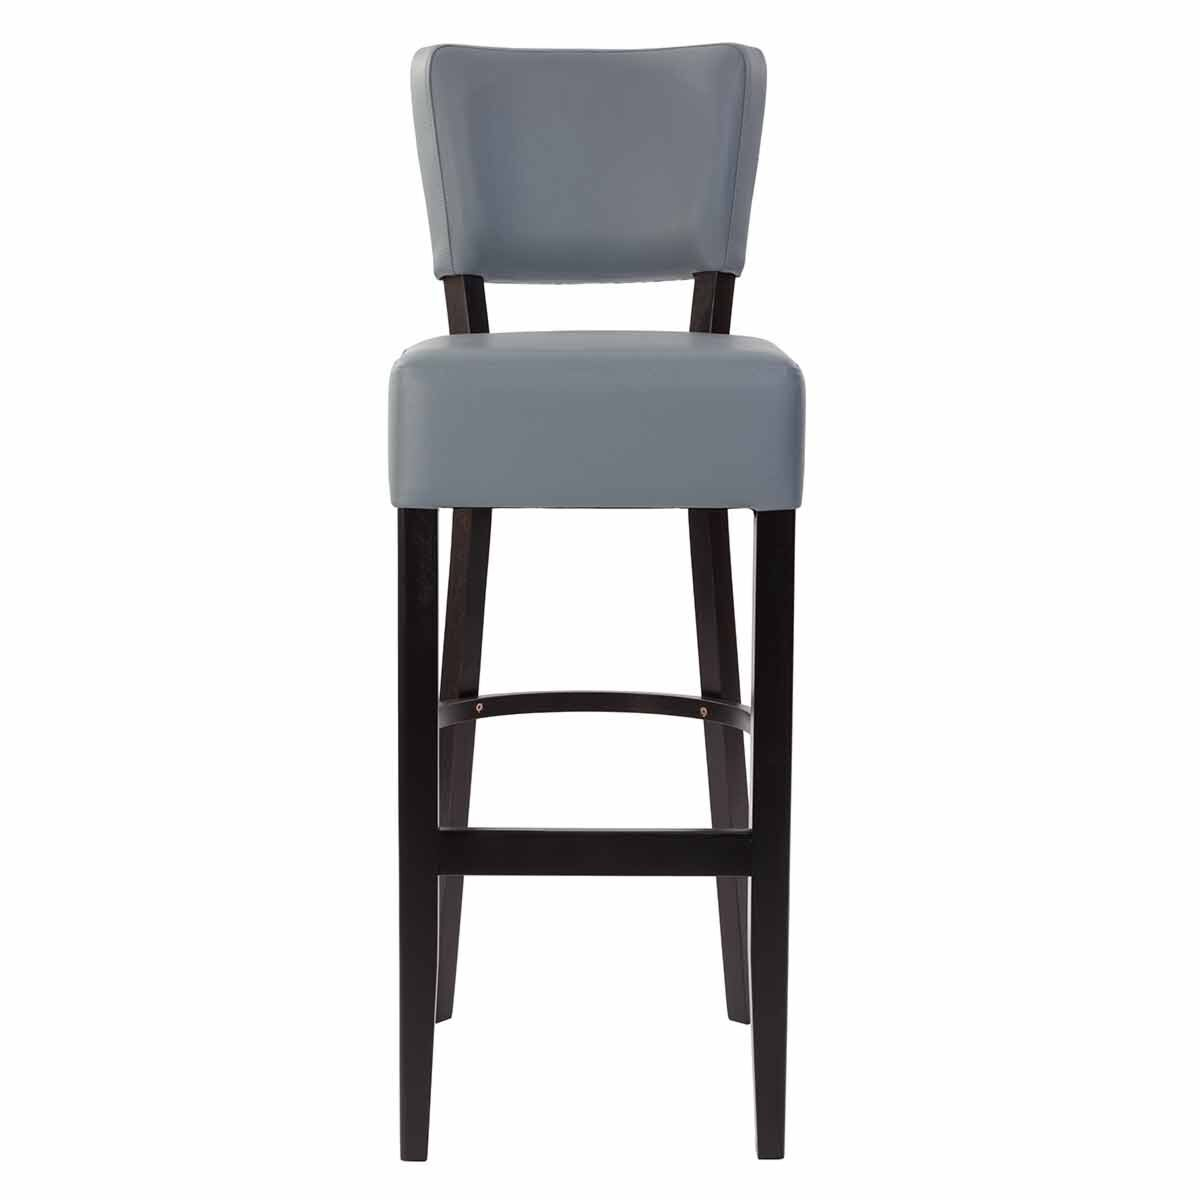 Tabilo Sena Faux Leather Bar Chair Grey